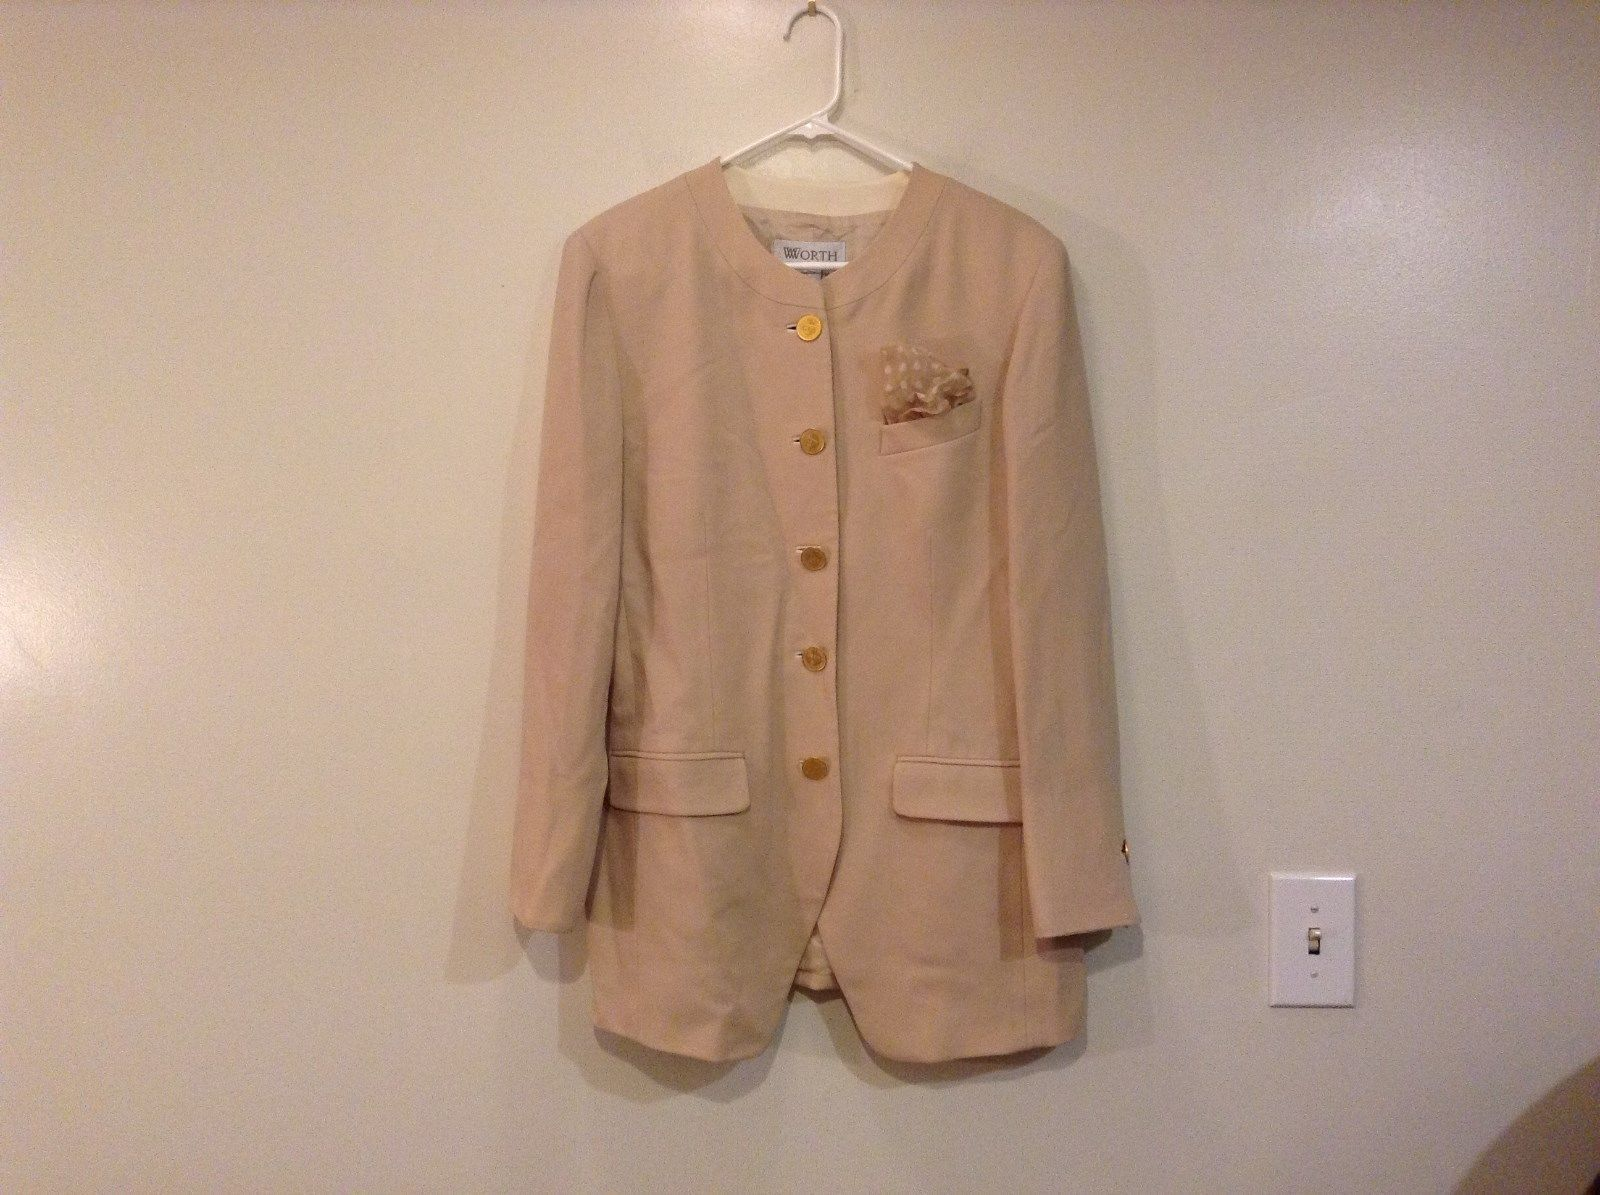 Worth Beige Lined 100 Percent Wool Blazer Jacket Matching Pocket Scarf Size 14